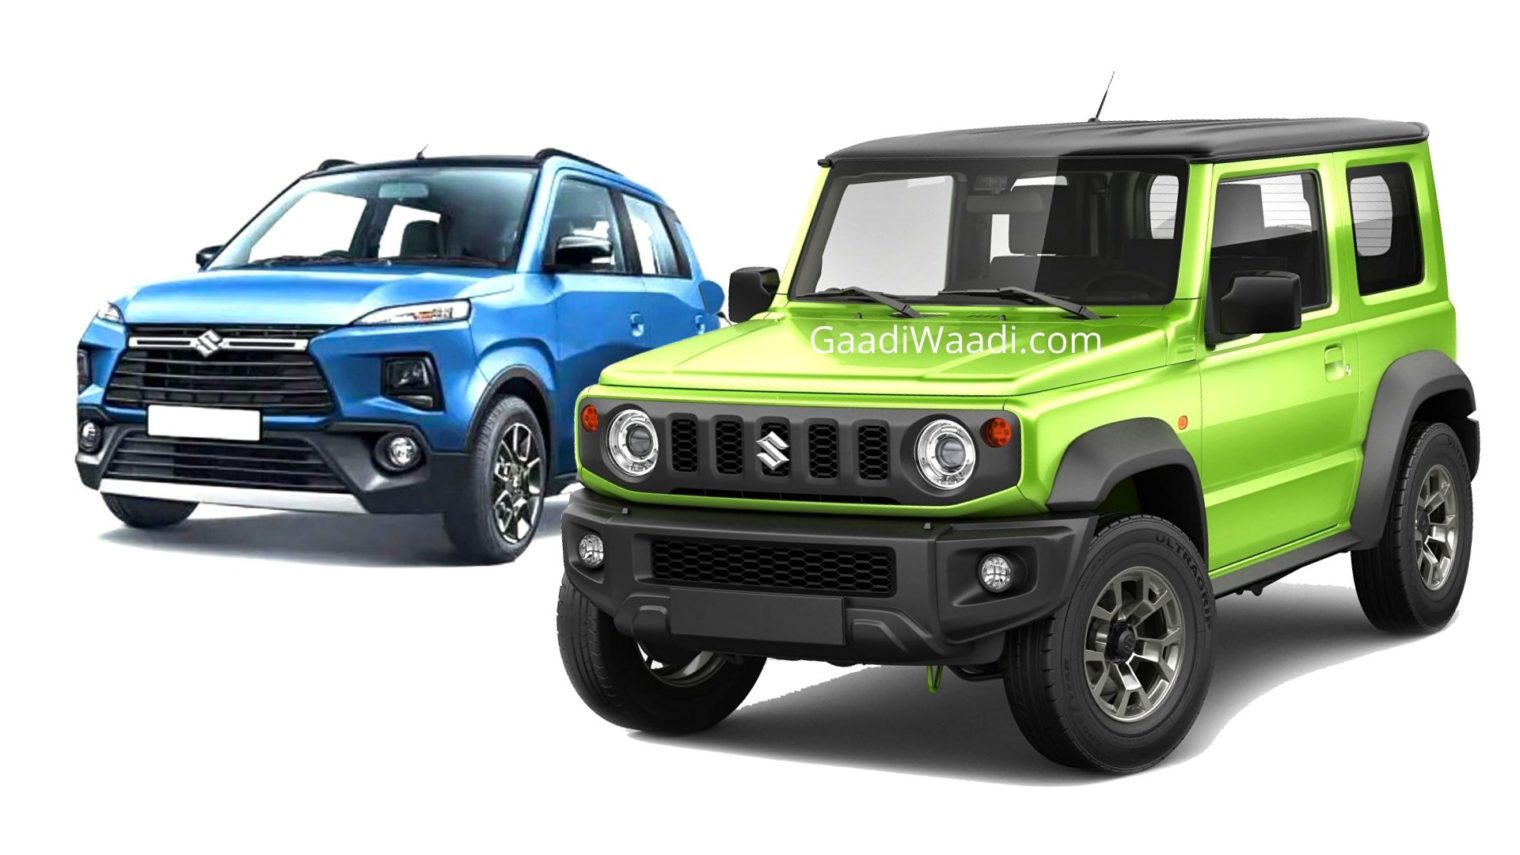 5 New Maruti Suzuki Cars Coming In Next 12-18 Months